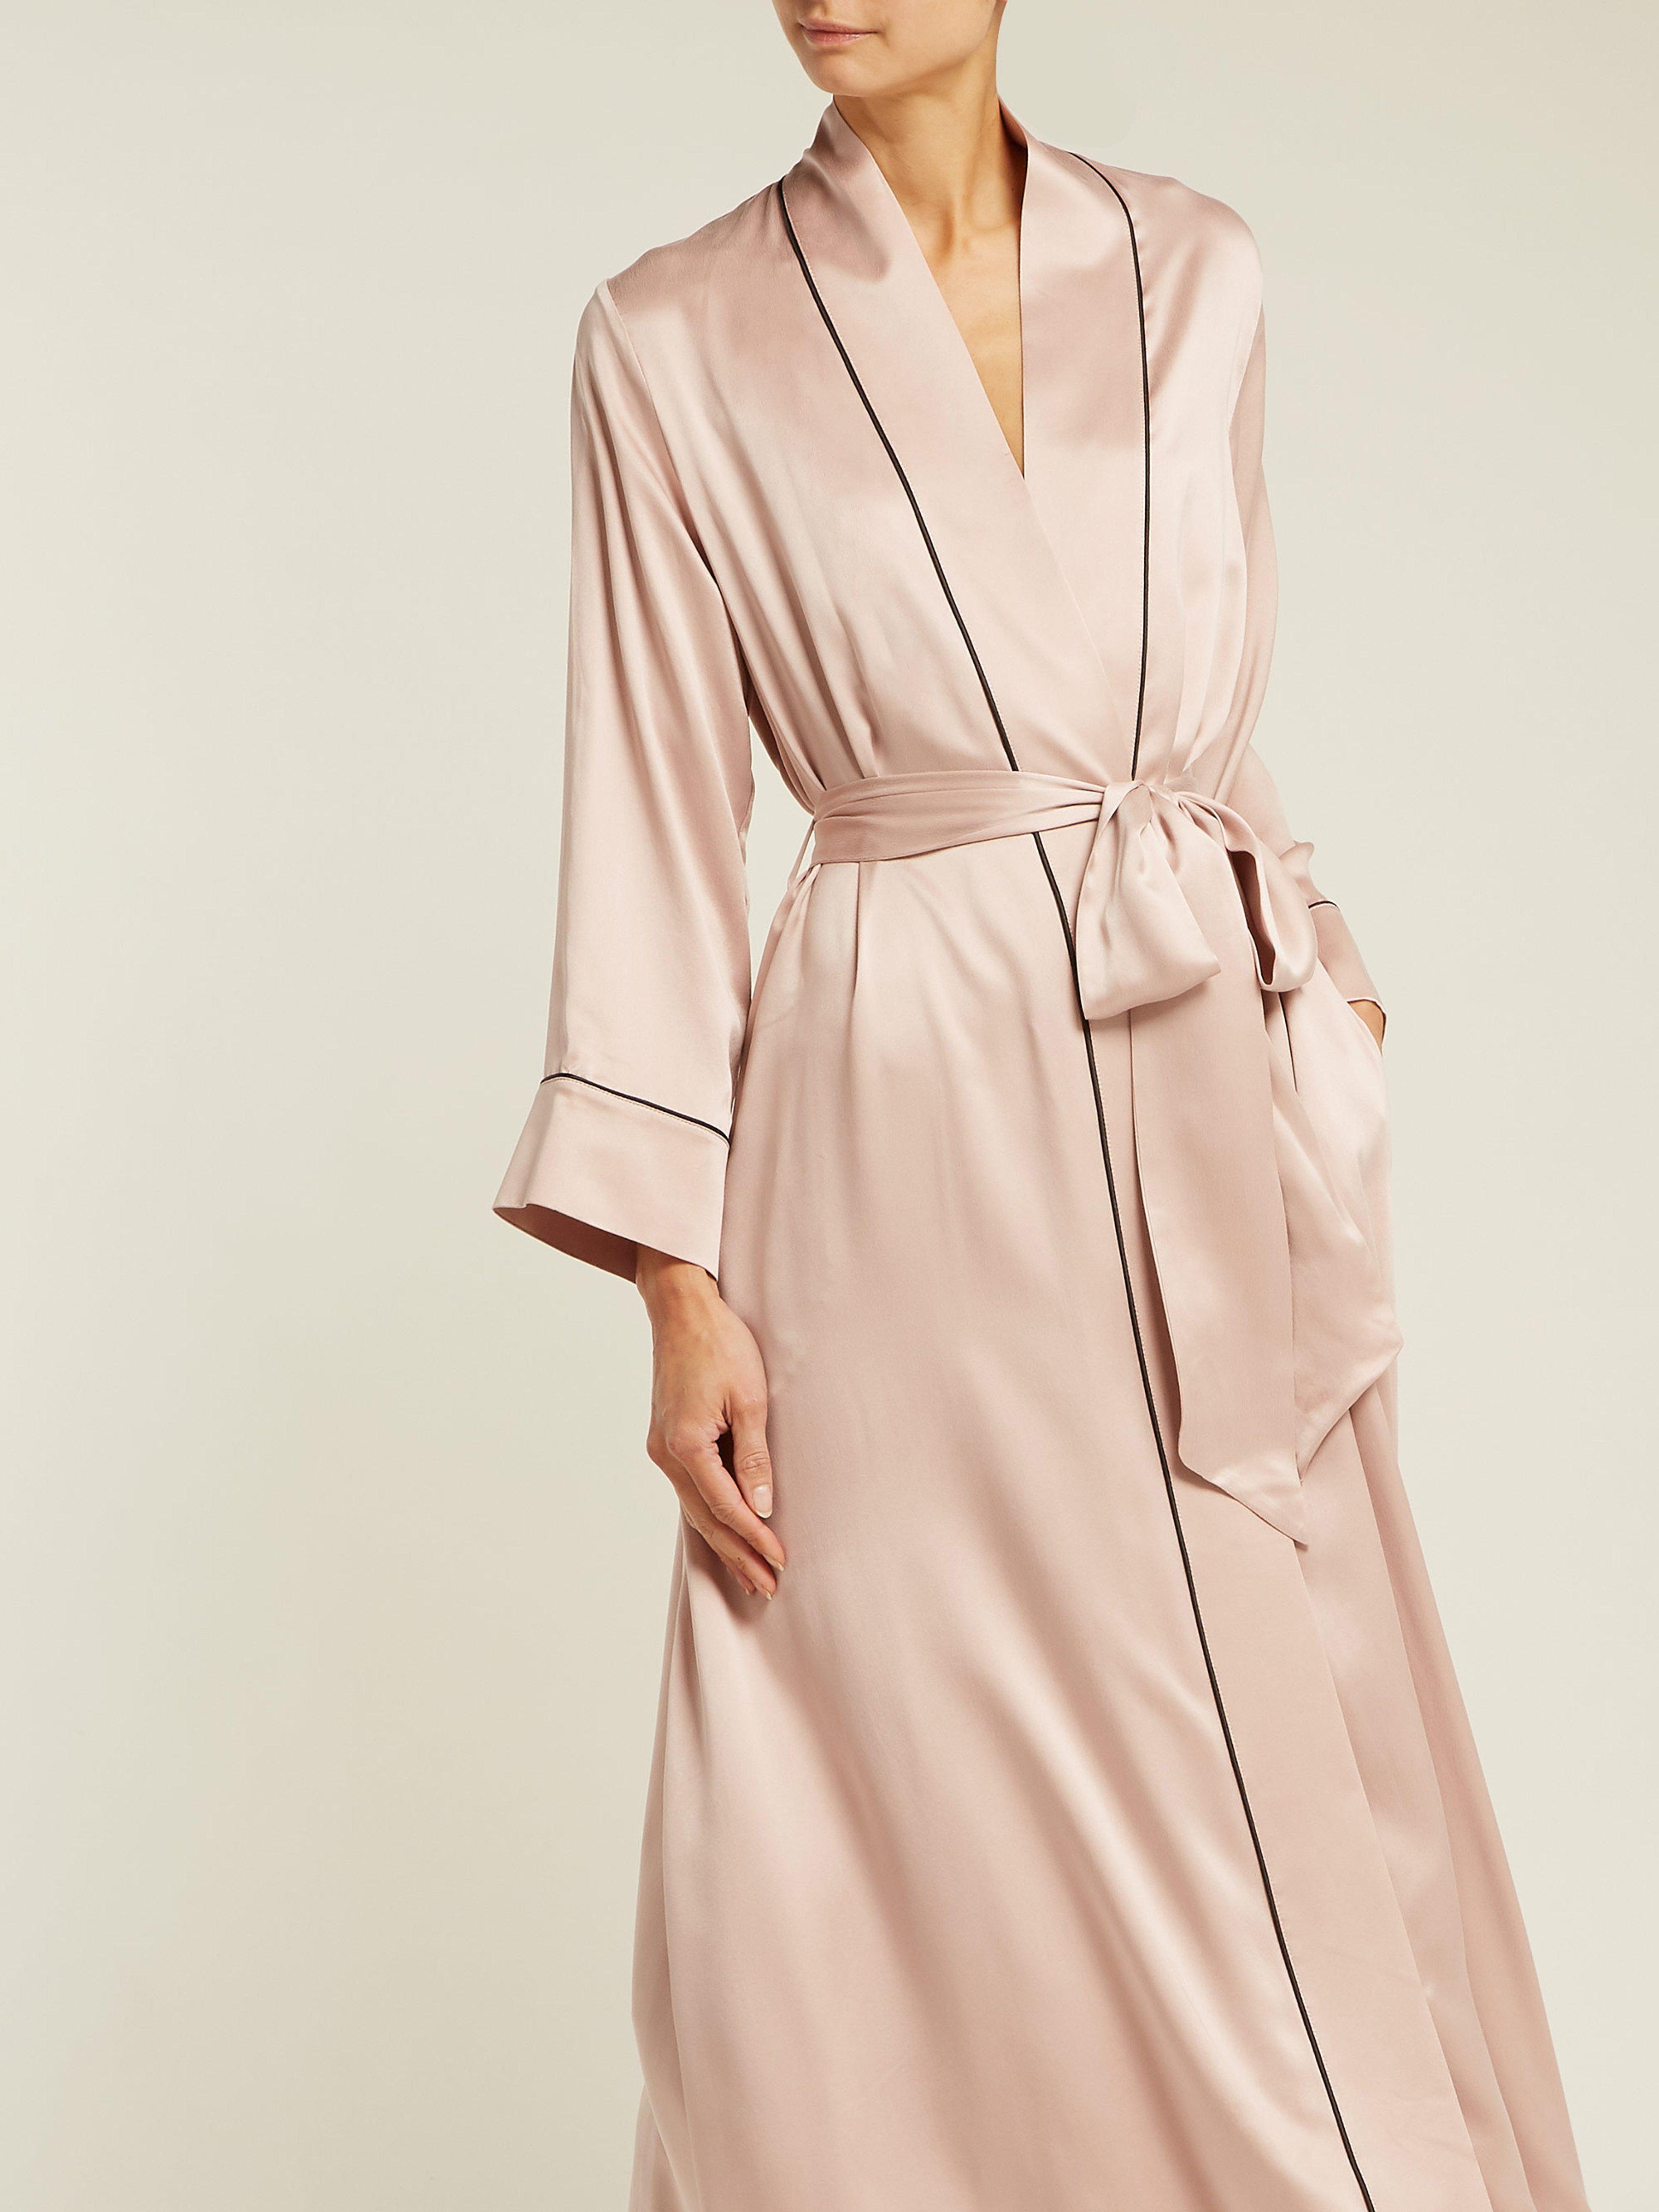 703b1ef0e0 Morpho + Luna Jade Silk Robe in Pink - Lyst